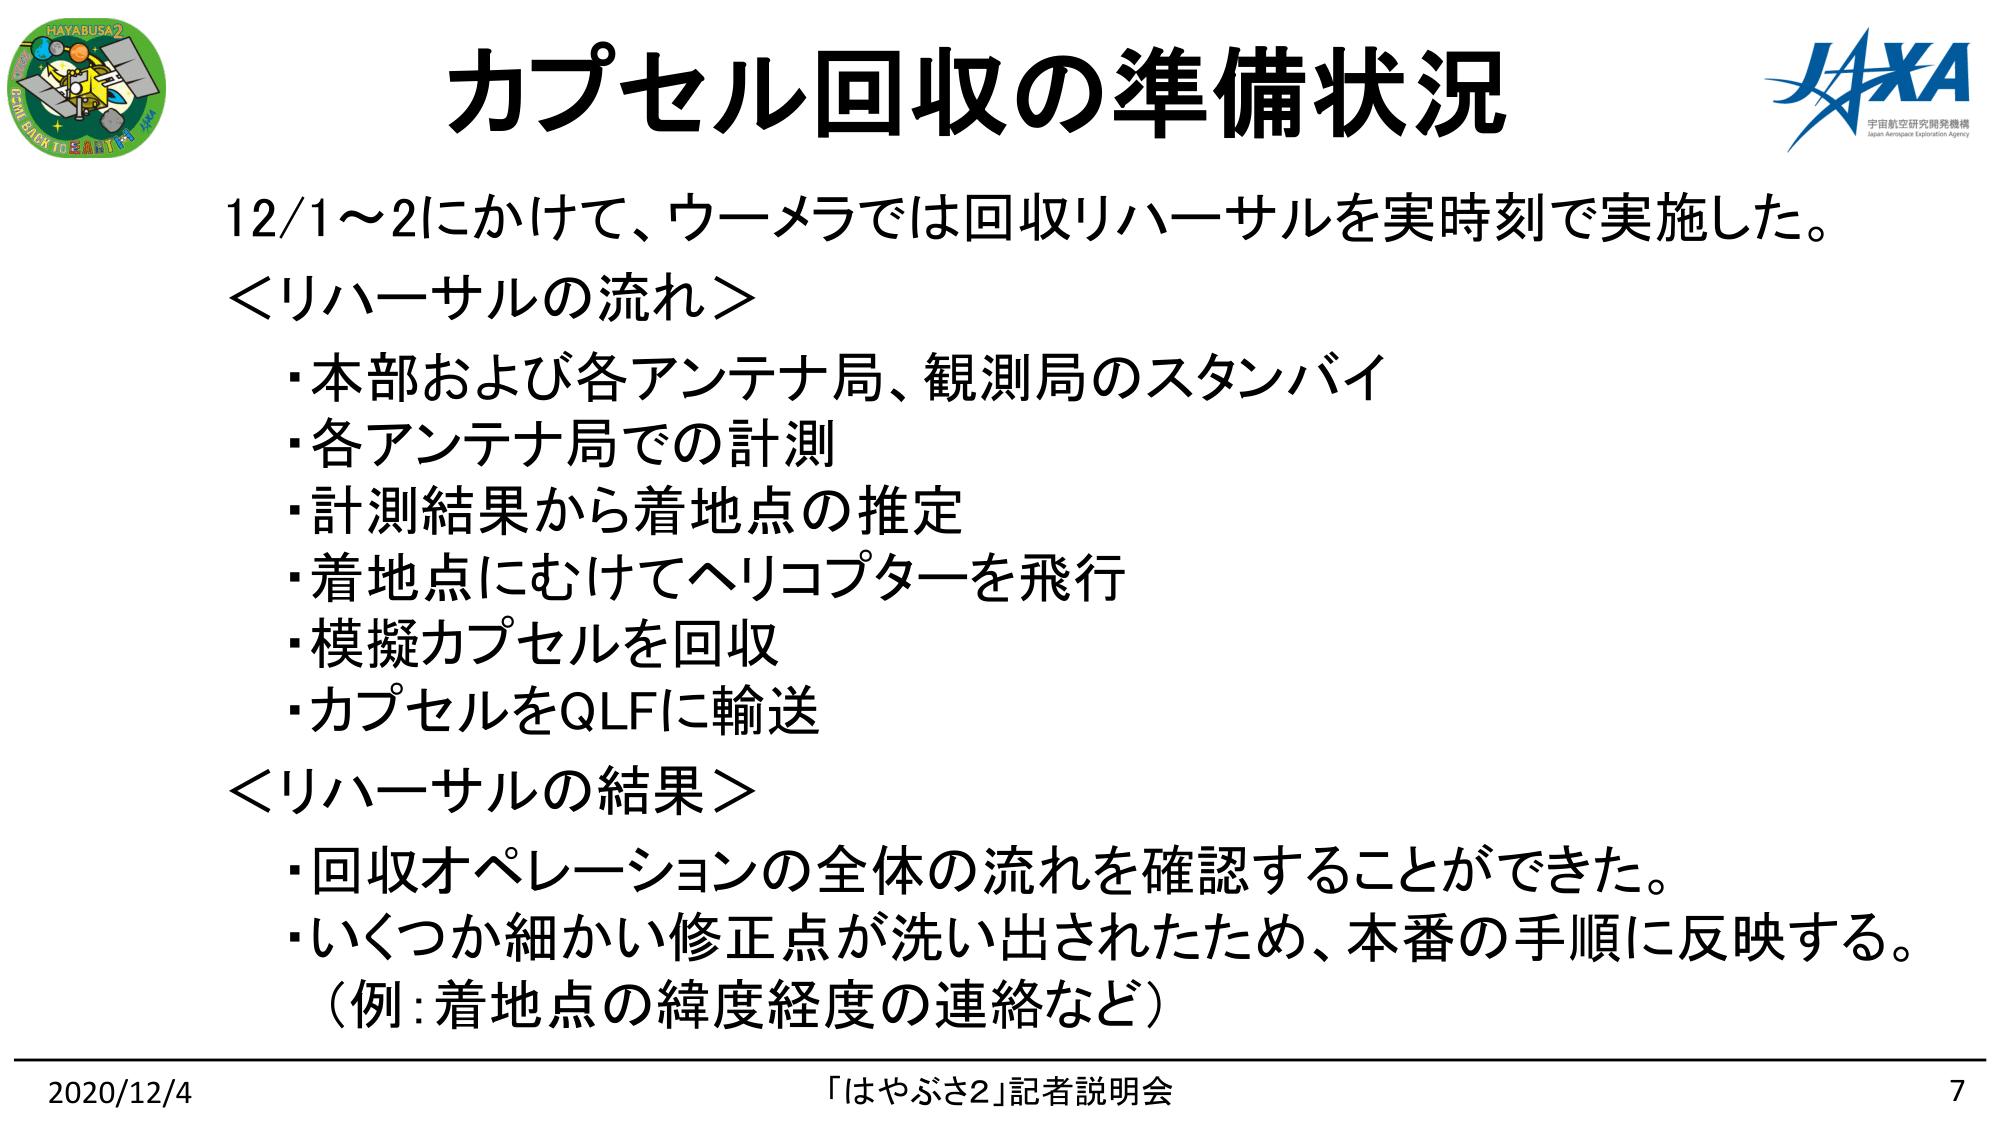 f:id:Imamura:20201204153803p:plain